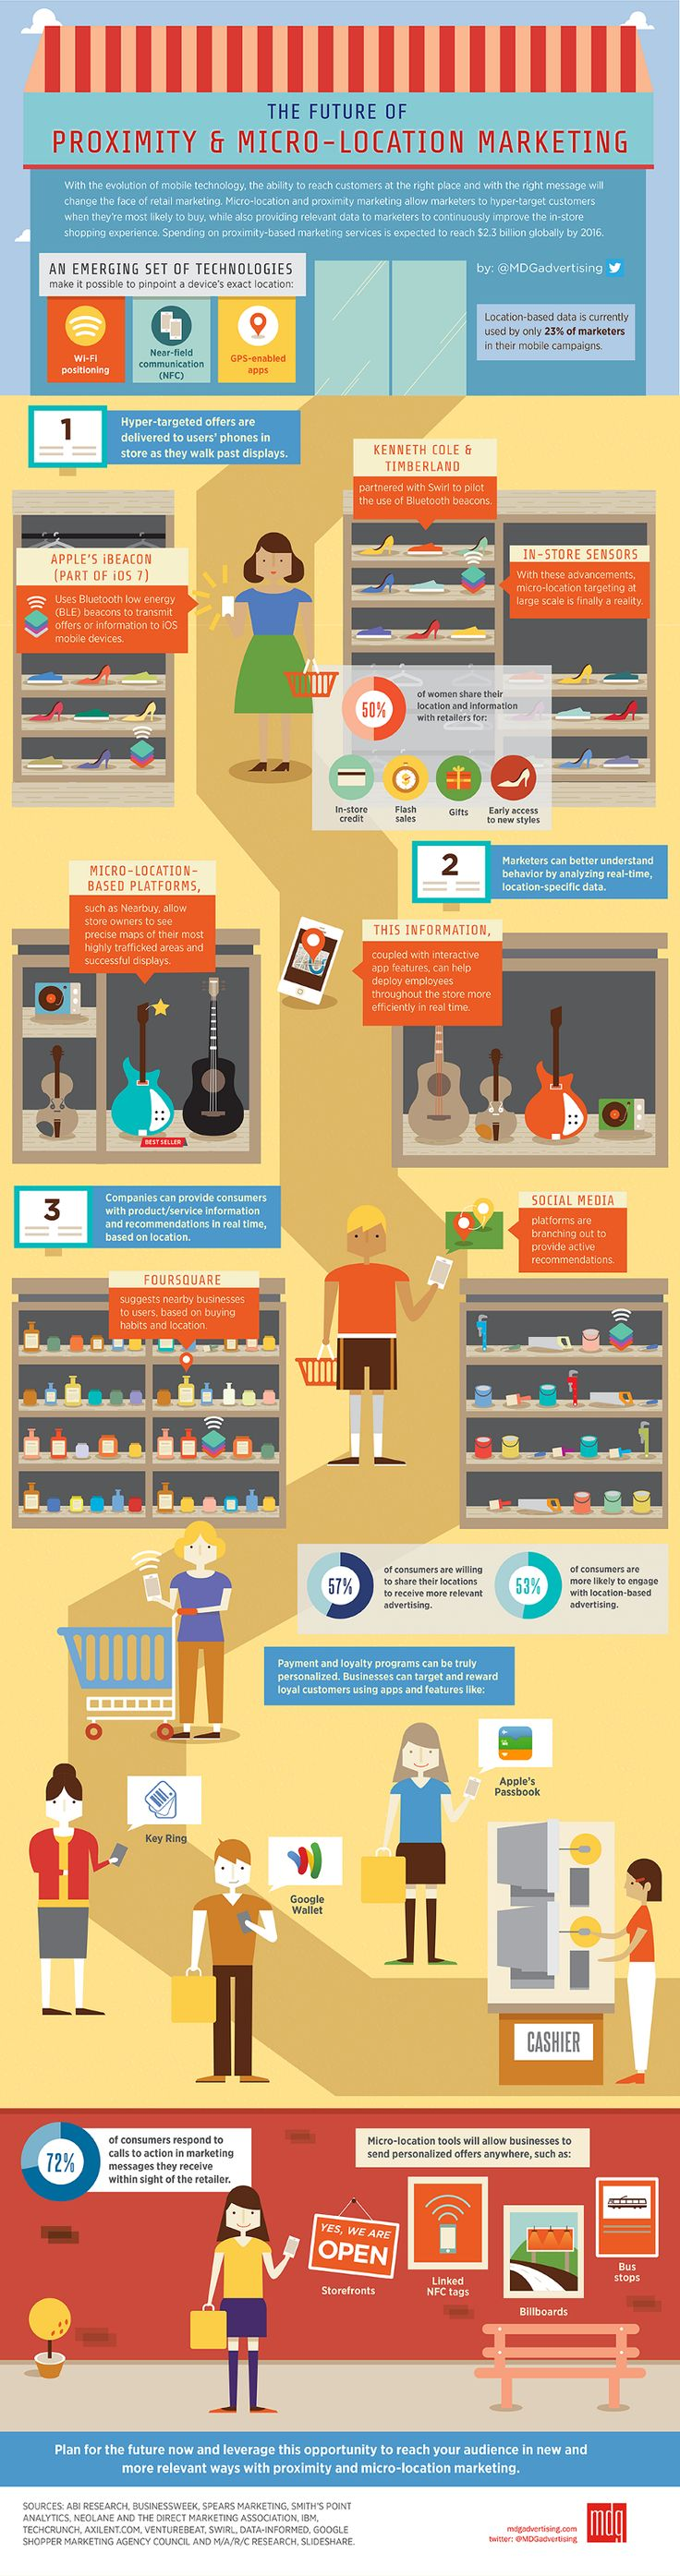 4 Ways Companies Use Proximity Marketing to Increase Sales